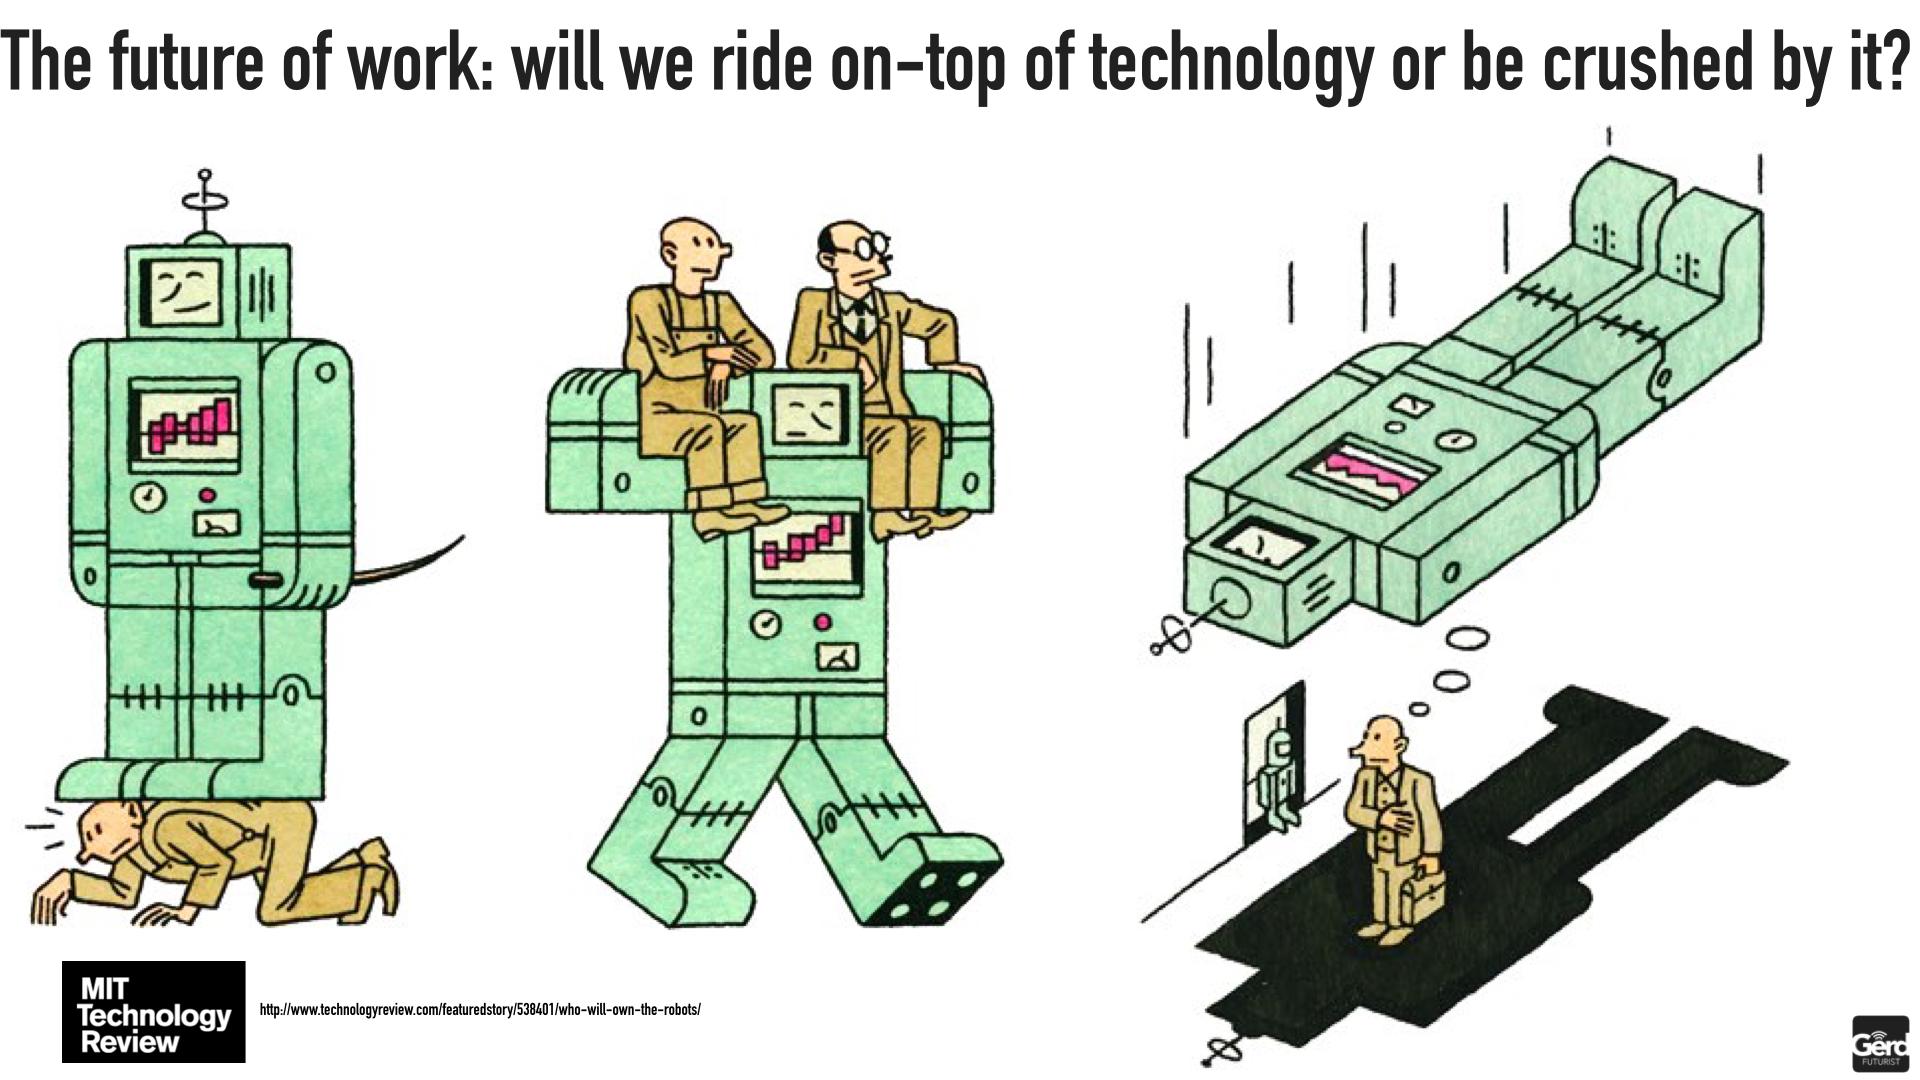 technology and humanity the future gerd leonhard futurist london public.020